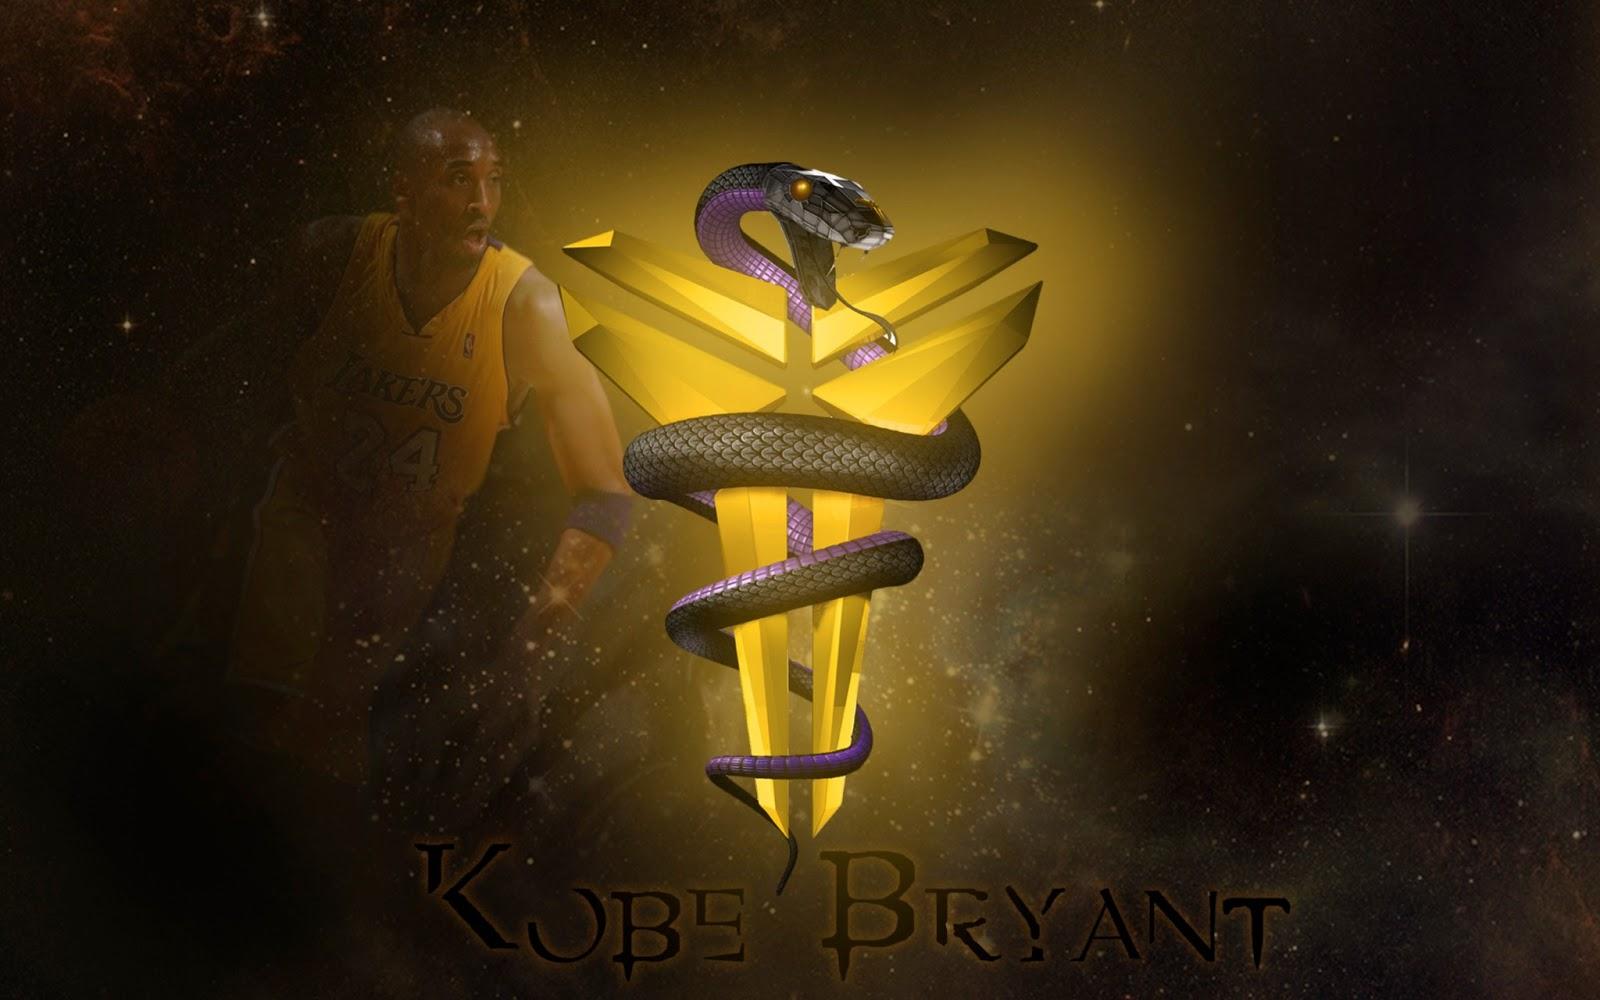 kobe bryant logo 4 HD Wallpaper Basketball Wallpapers 1600x1000